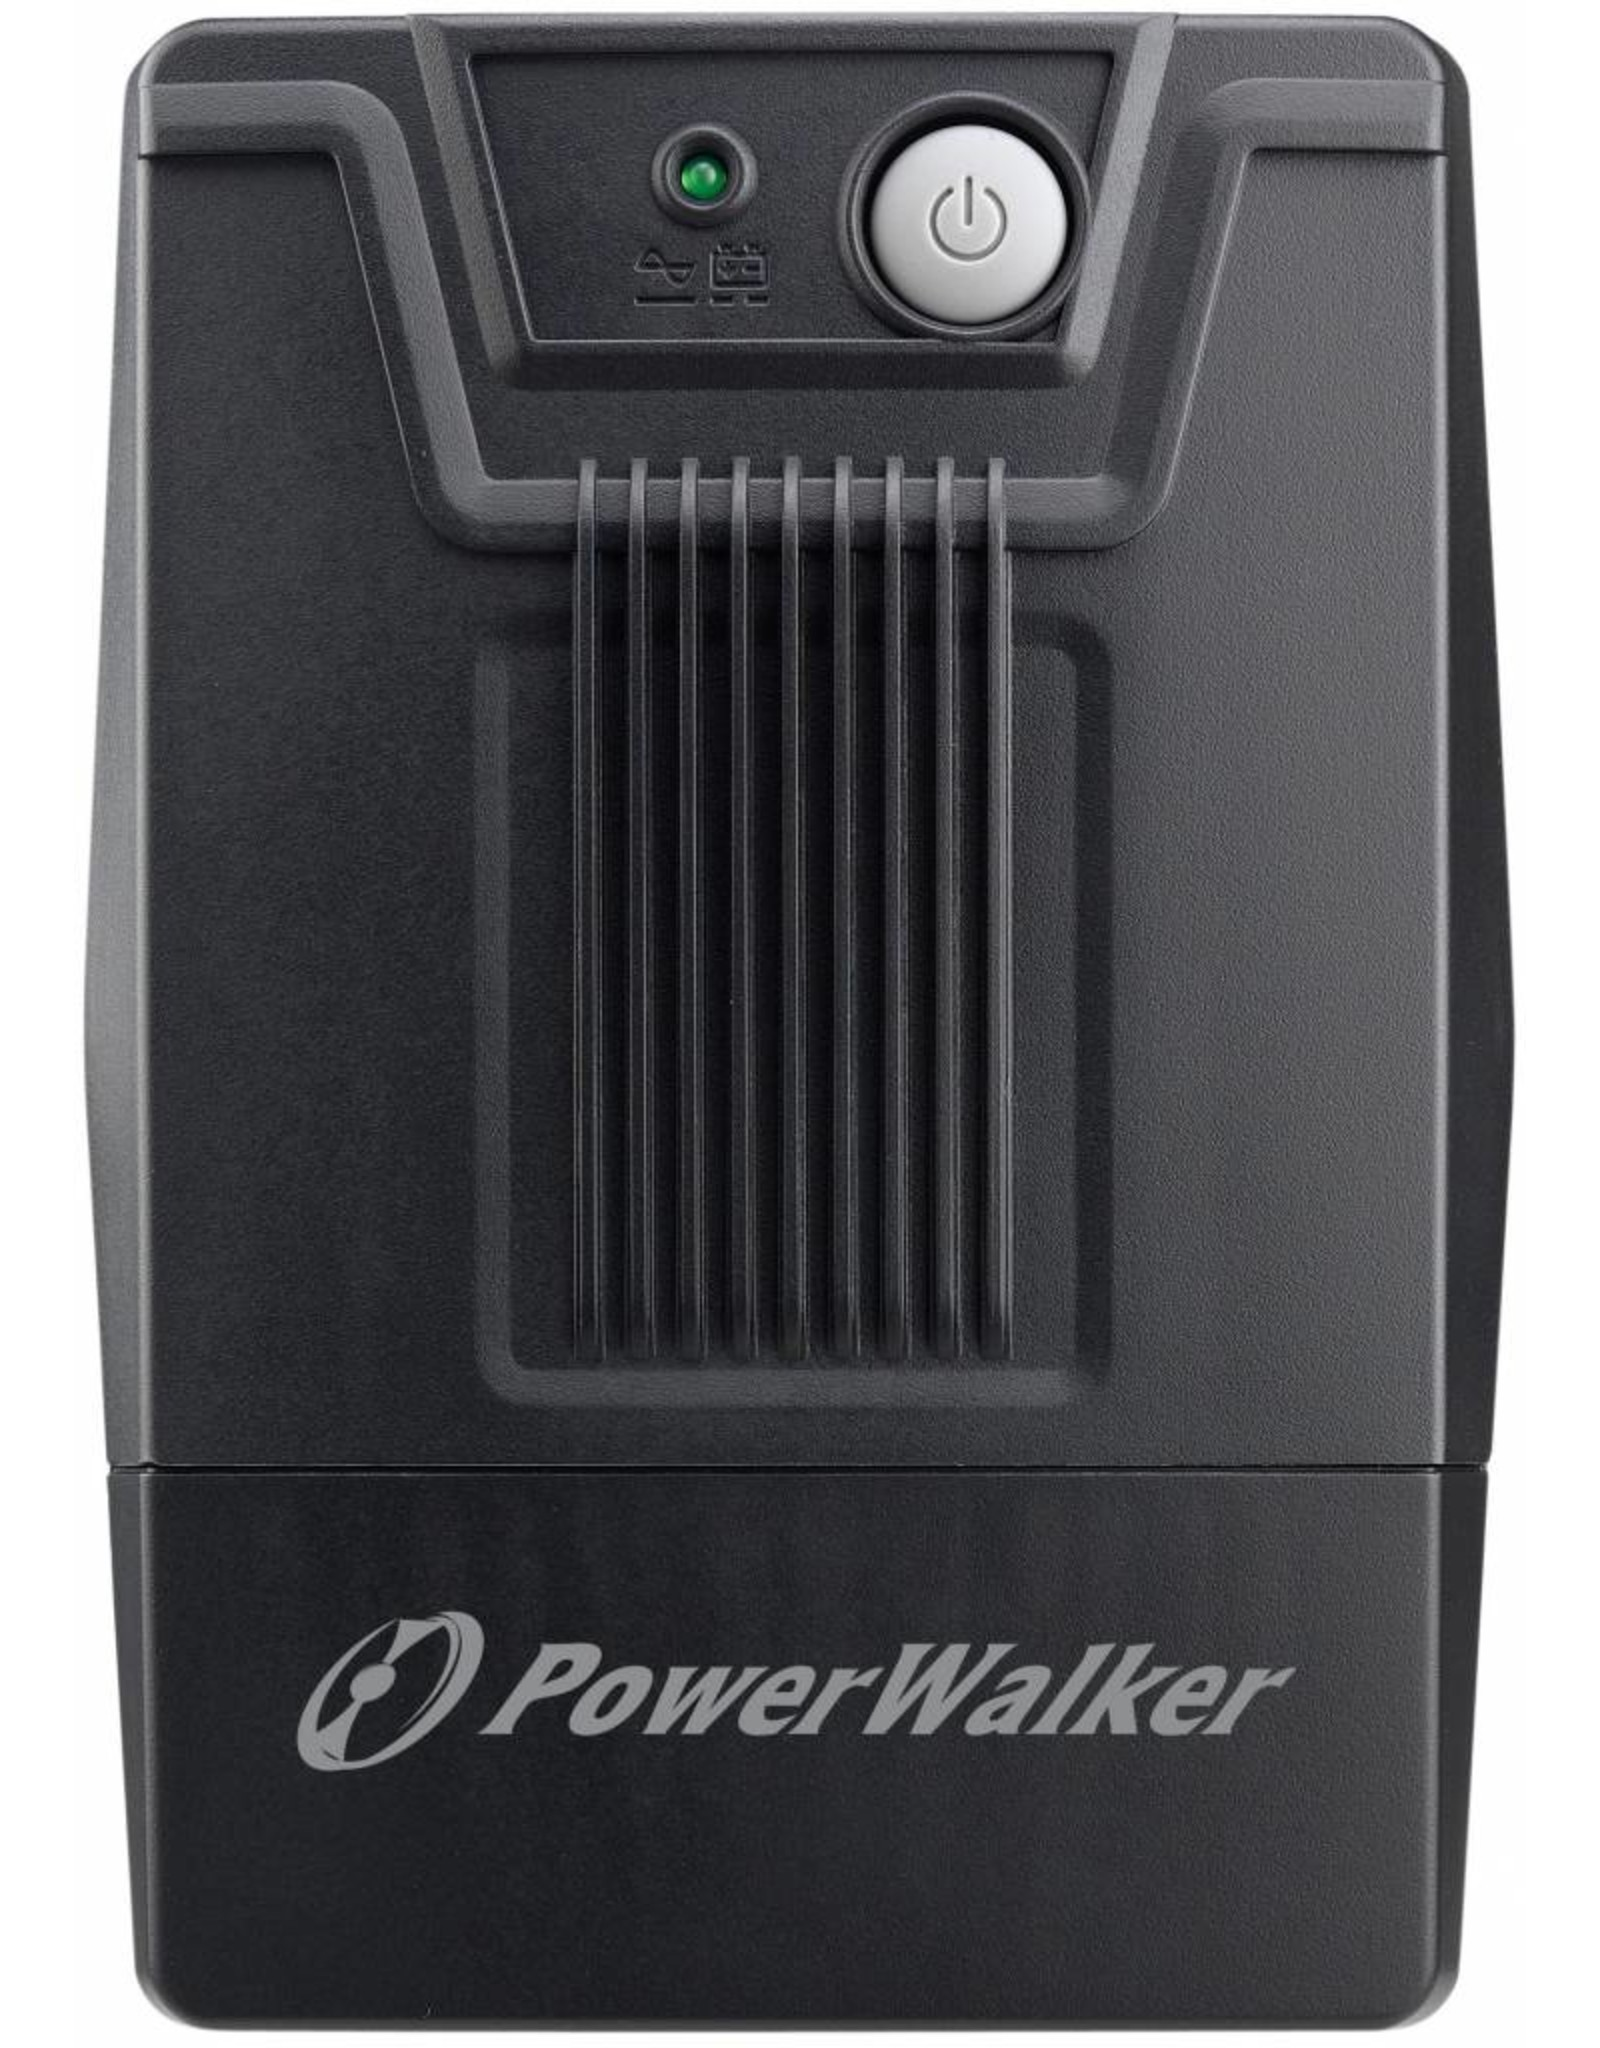 BlueWalker BlueWalker VI 800 SC Schuko Compact Zwart UPS